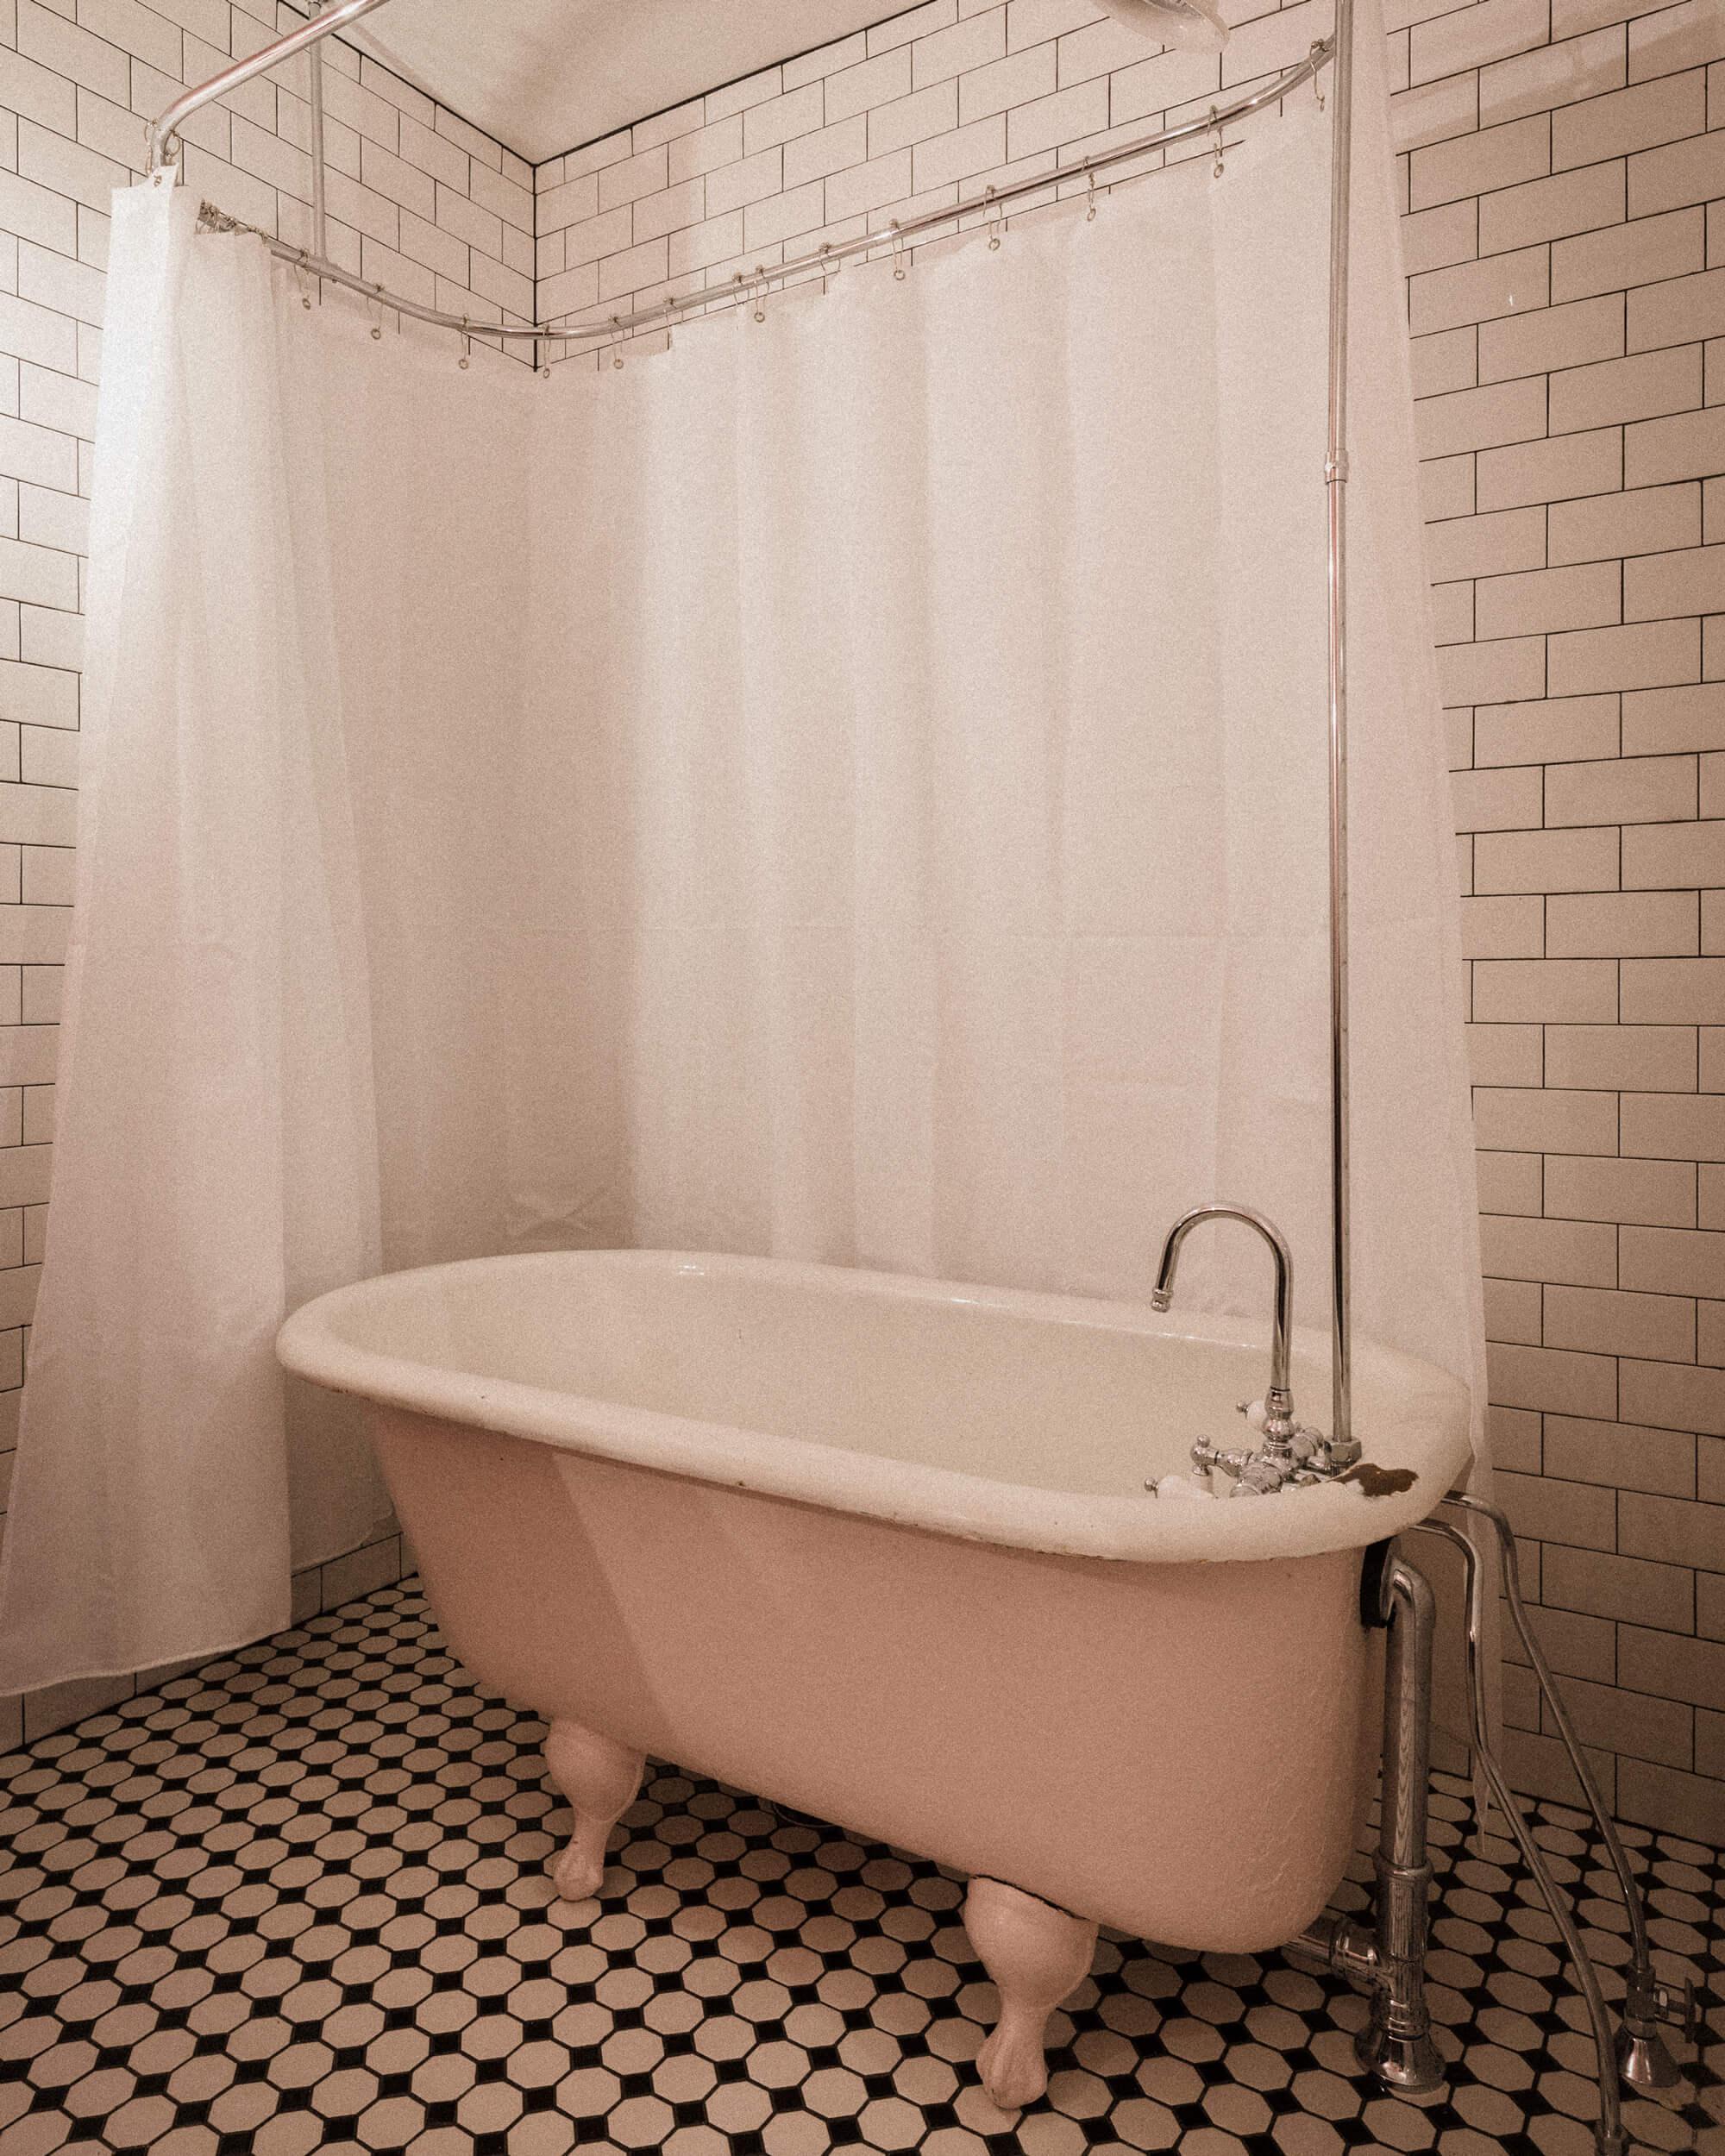 READ_HOUSE_311_BATHTUB_PHOTO.jpg